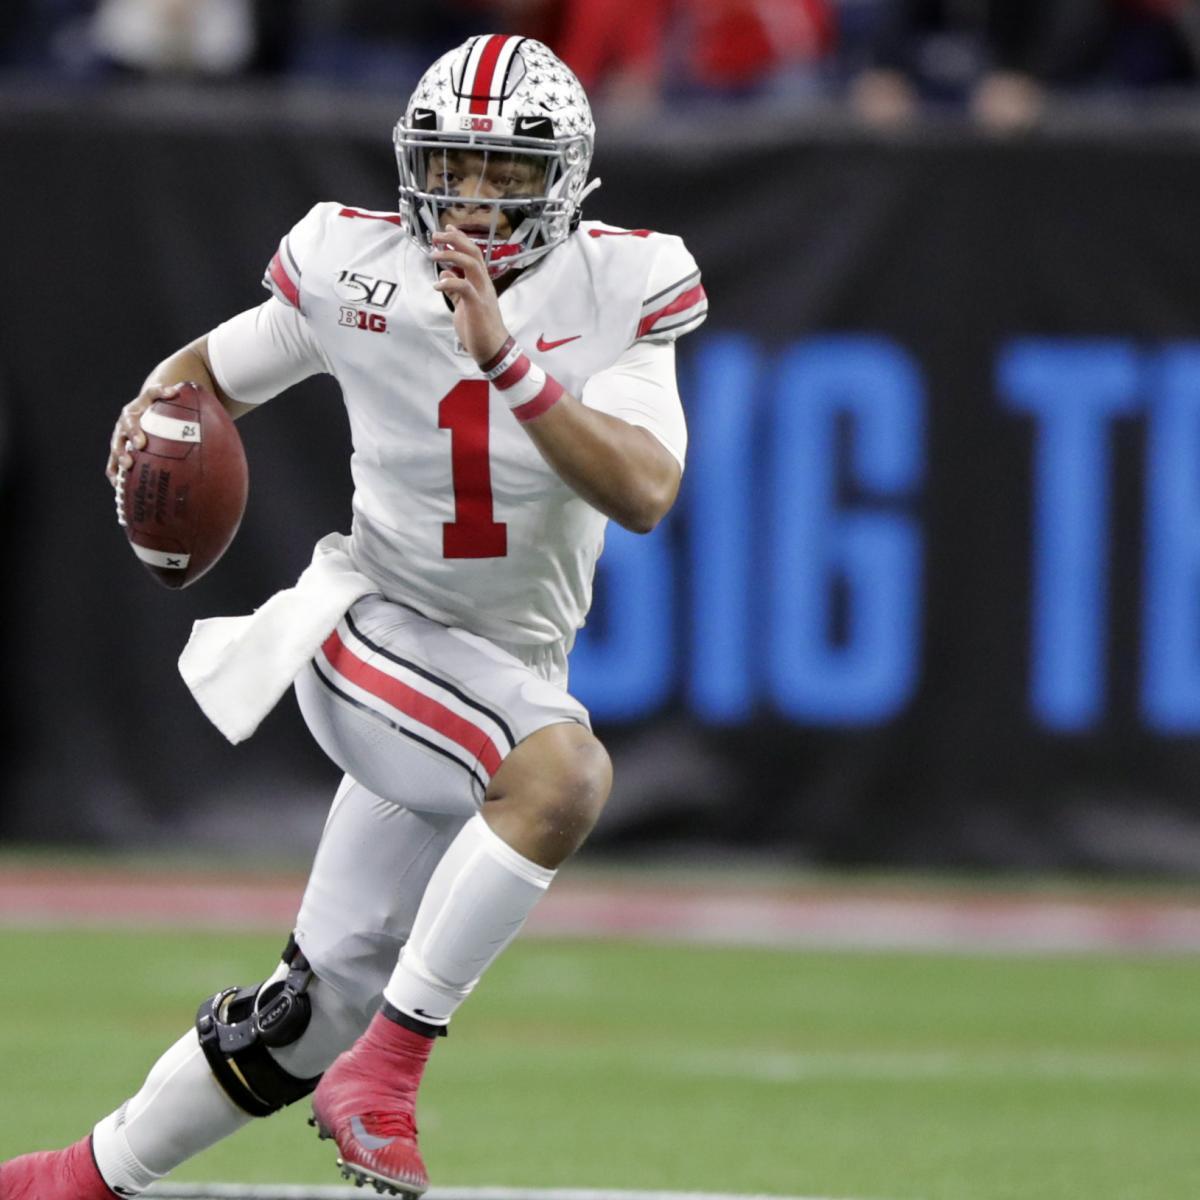 College Football Rankings 2020: Week 9 Polls and Top 25 Standings Predictions